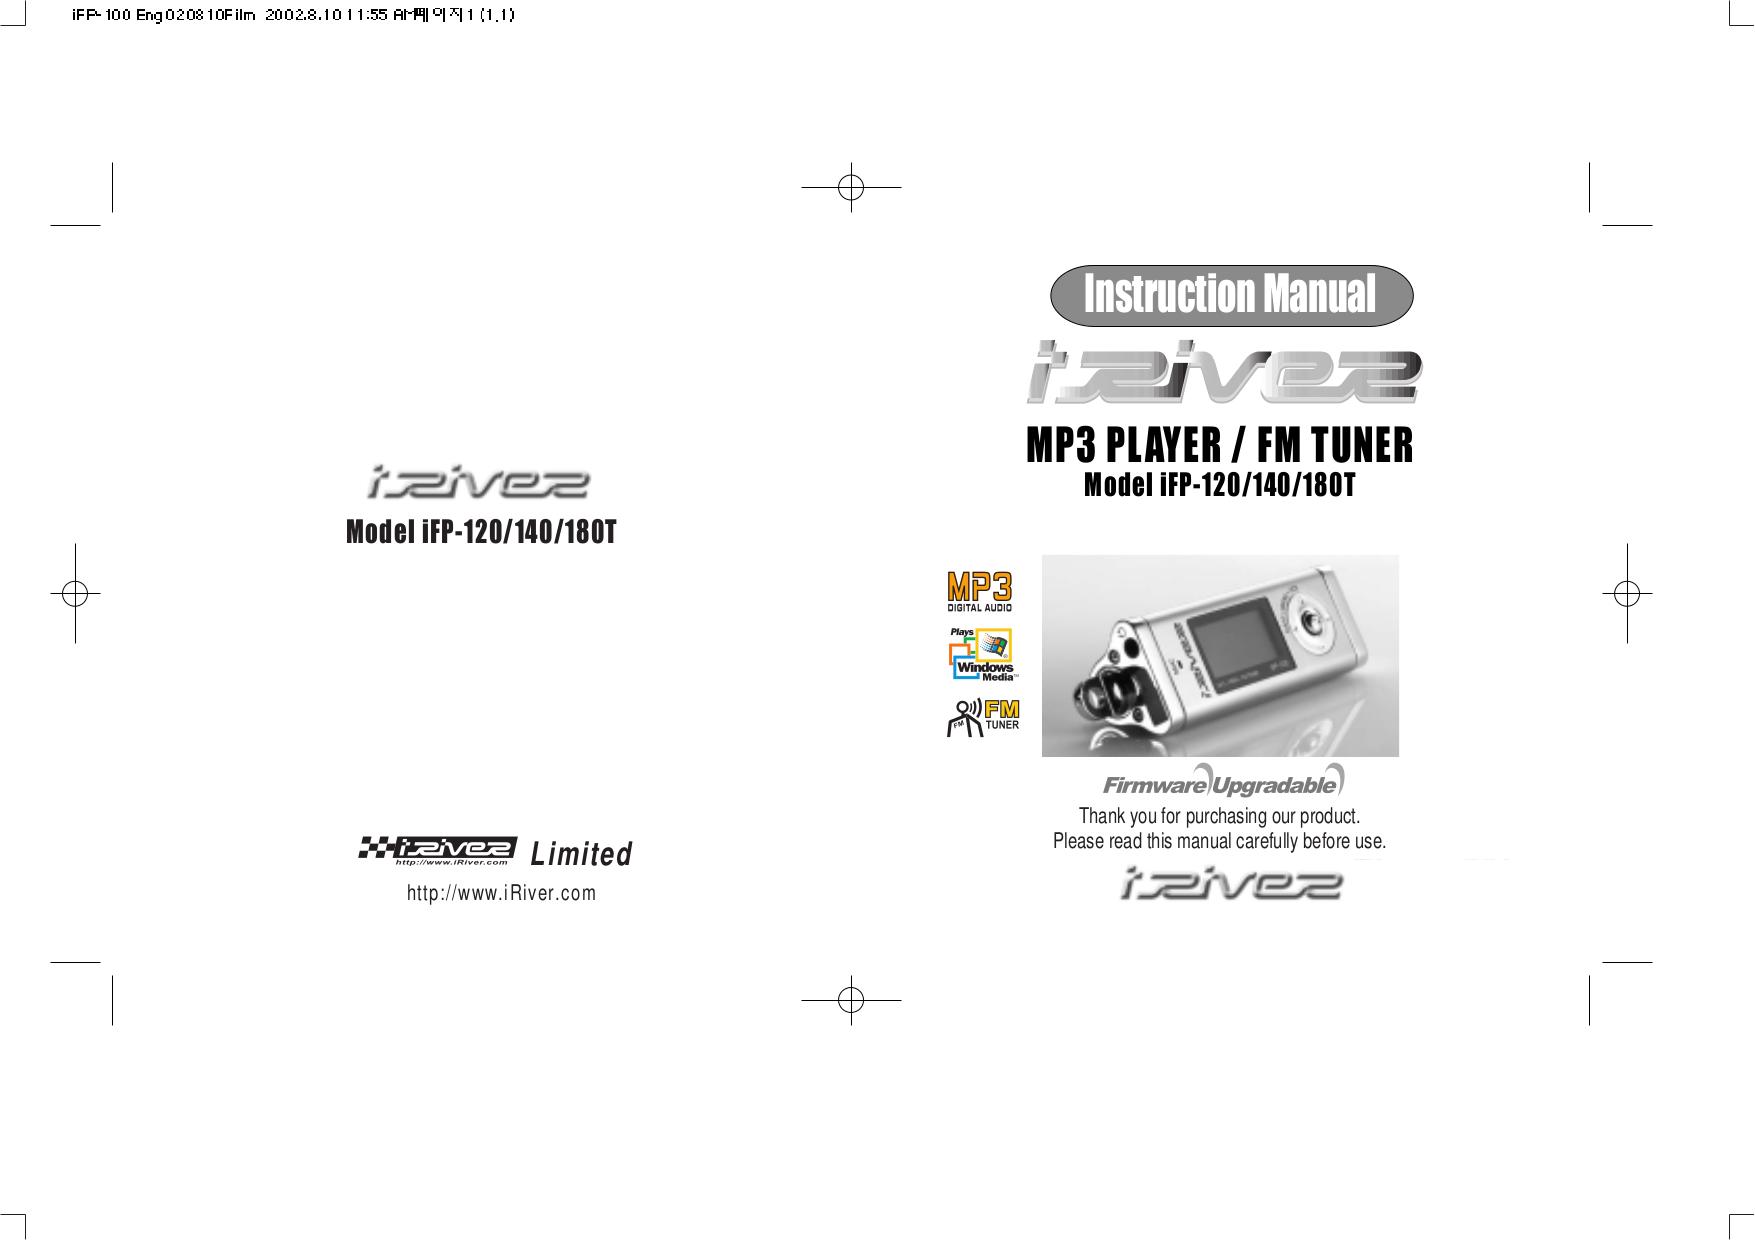 iriver user manual how to and user guide instructions u2022 rh taxibermuda co iriver e100 software for windows 7 E100 Krokodil